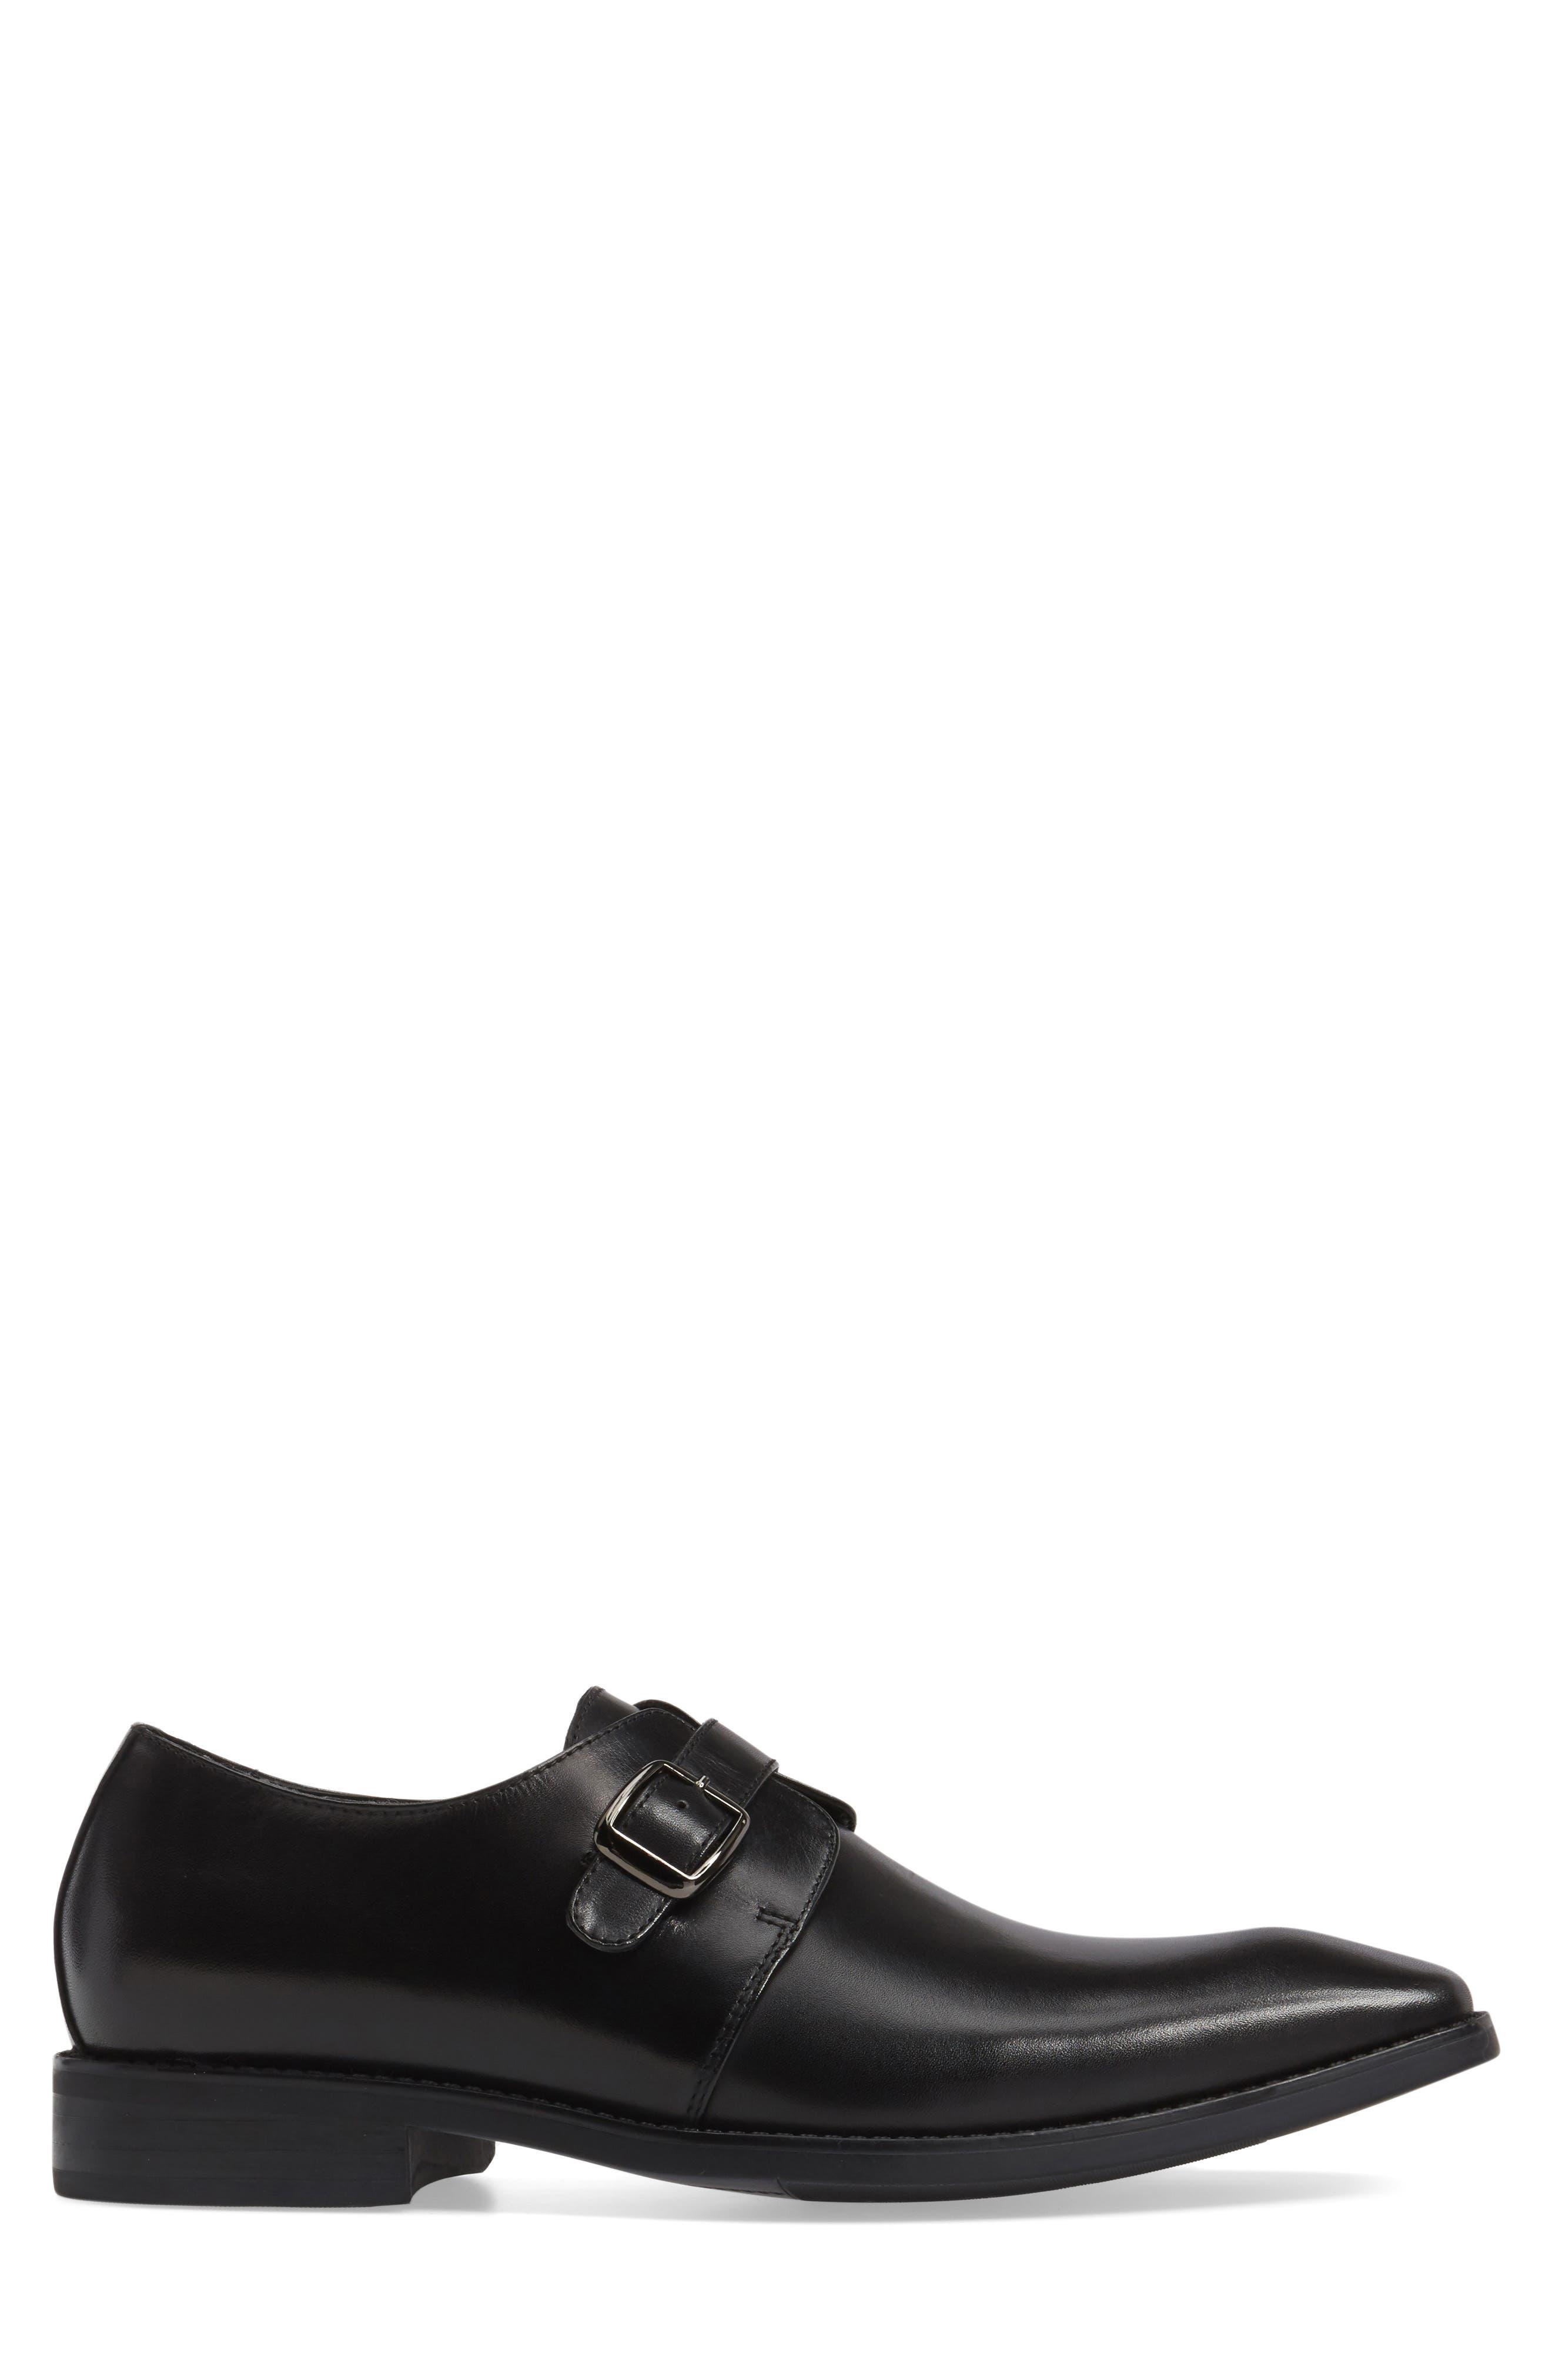 Landon Monk Strap Shoe,                             Alternate thumbnail 3, color,                             001